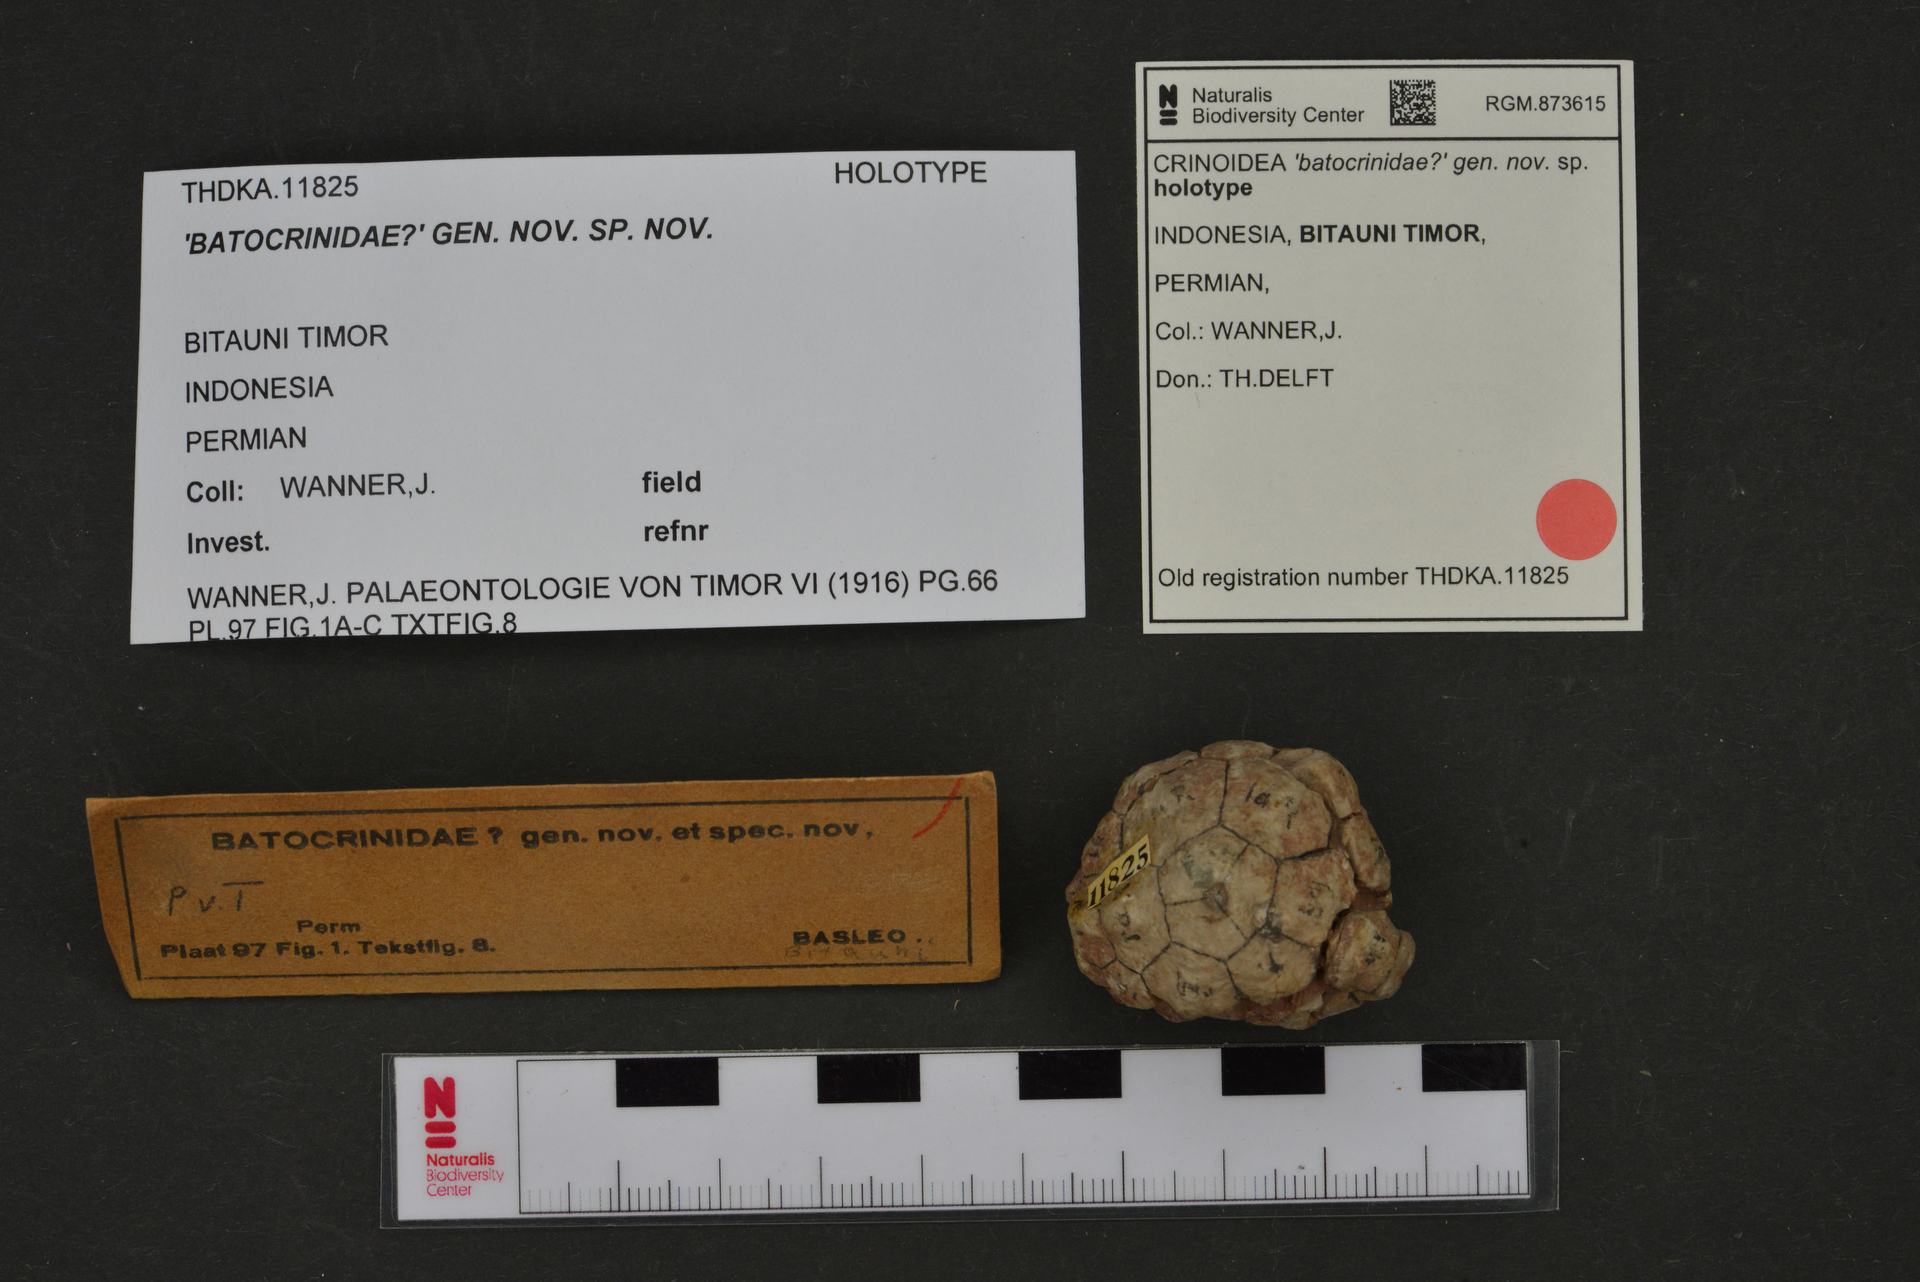 RGM.873615 | 'batocrinidae?' gen. nov.